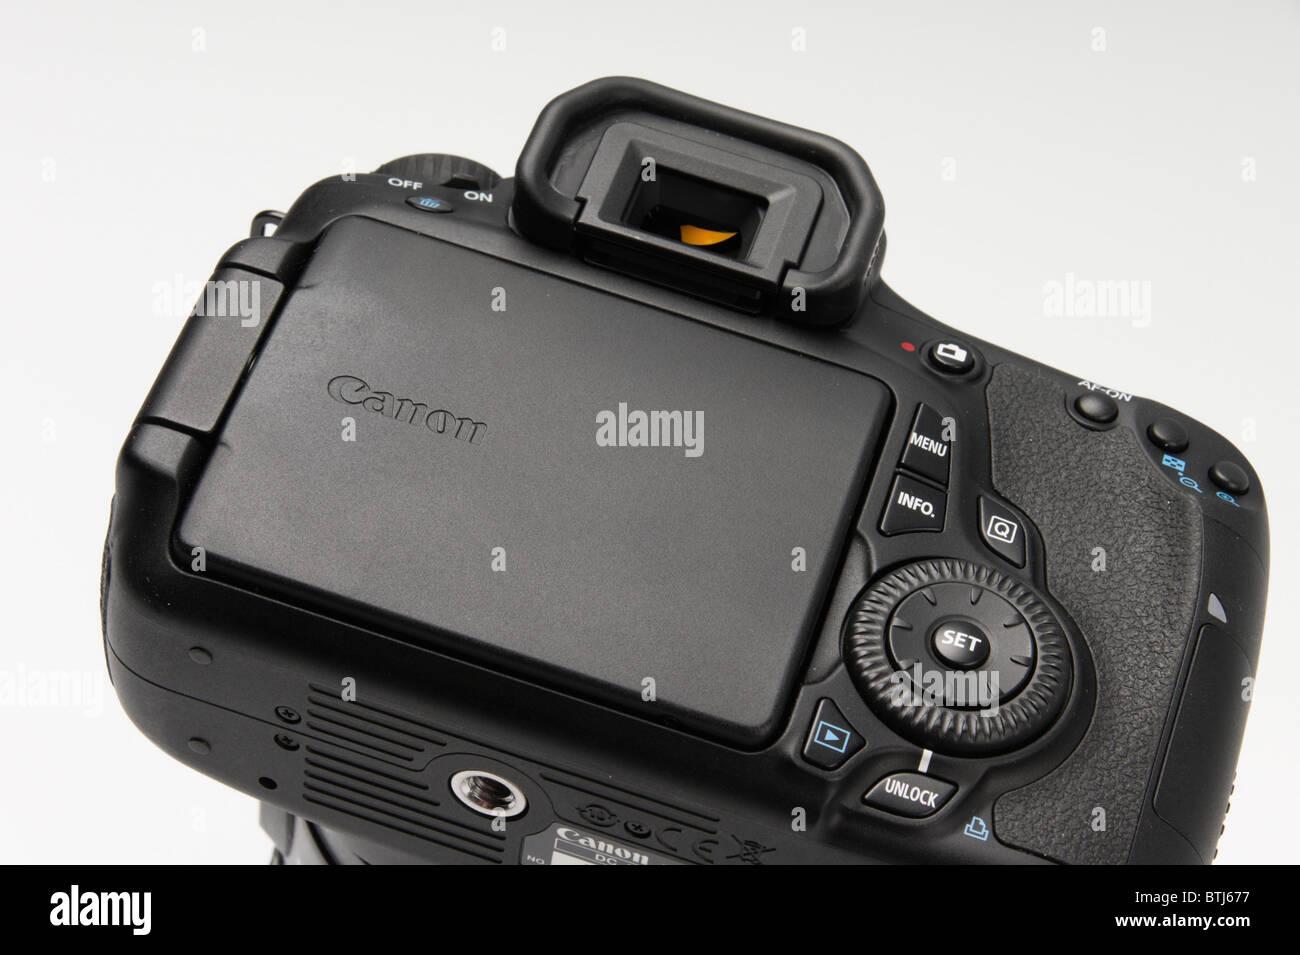 Canon 60D digital single lens reflex camera late 2010 launch - rear